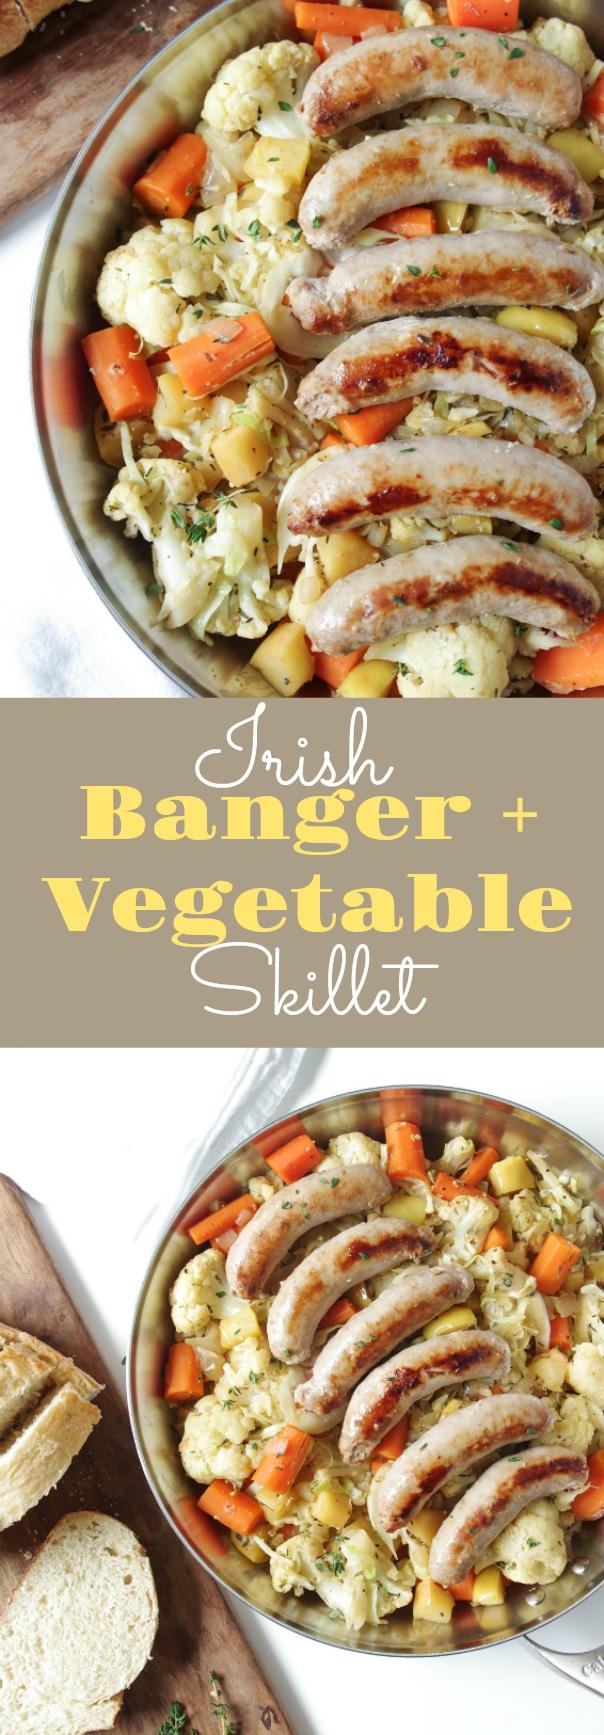 Irish Banger and Vegetable Skillet via @theforkedspoon #onepanmeal #skillet #dinner #sausage #bangersandmash #lowcarb #cauliflower